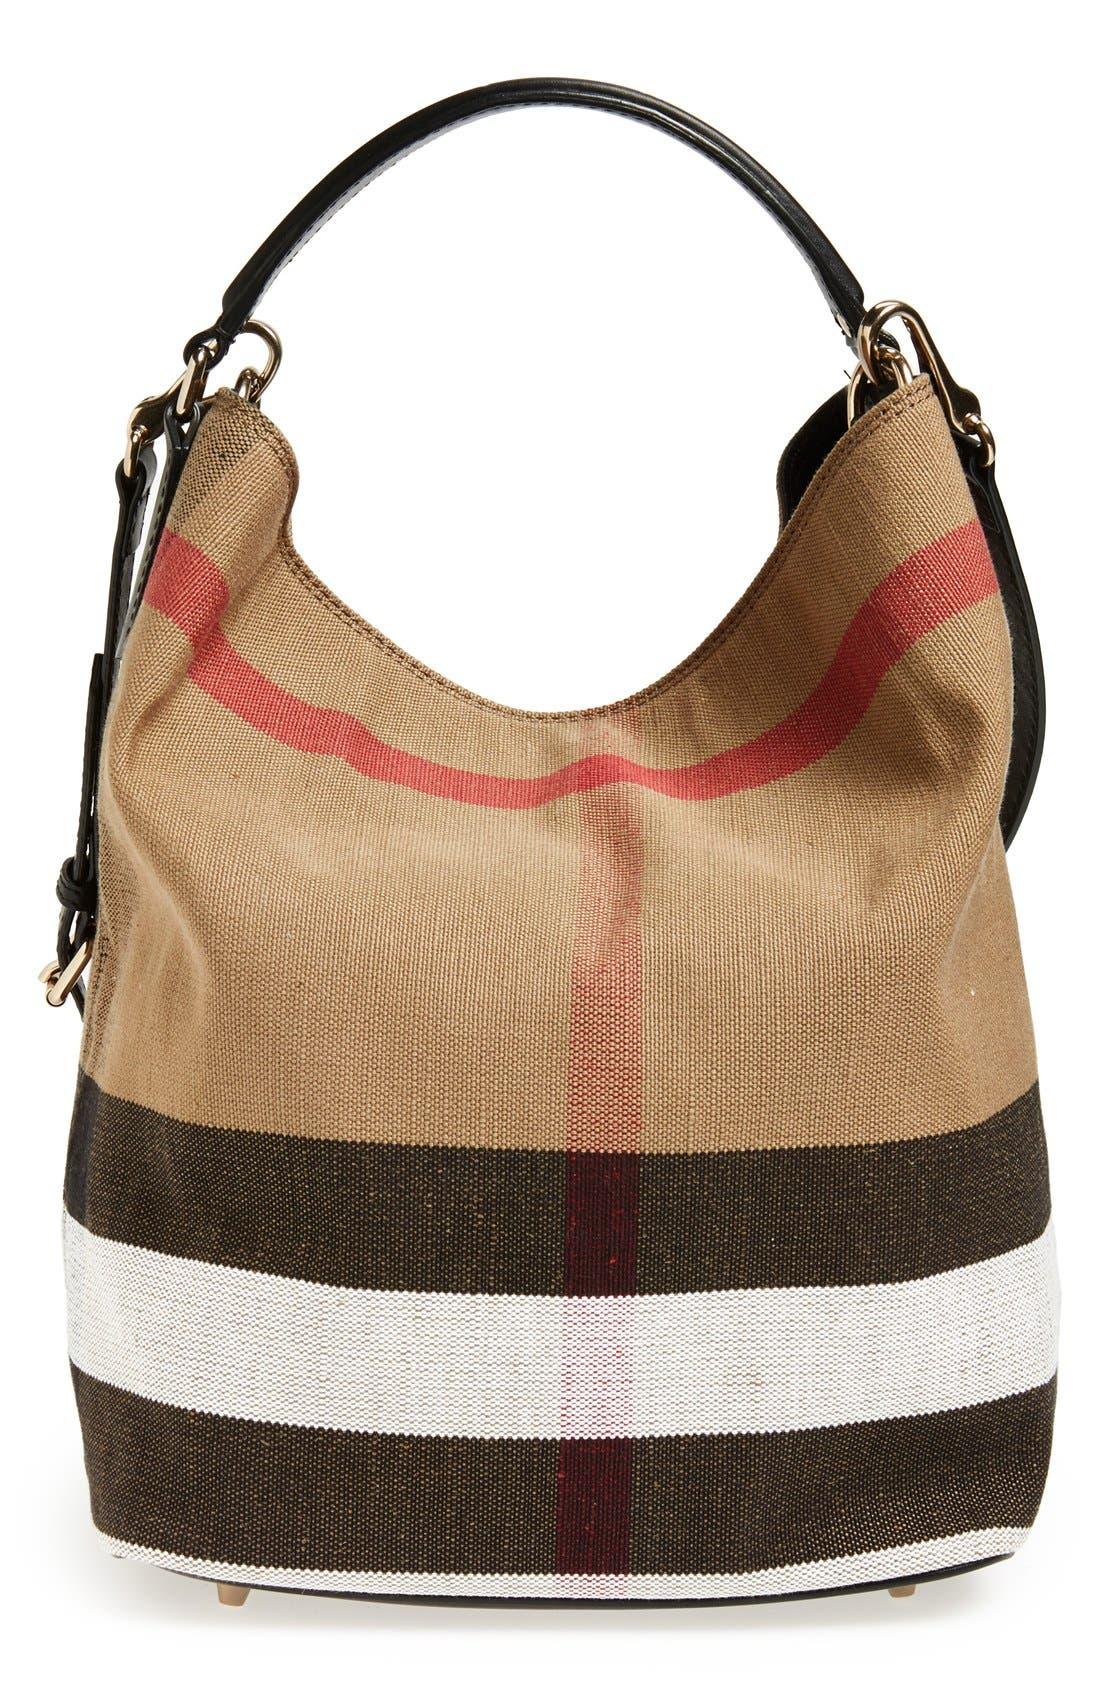 Burberry Medium Susanna Check Print Bucket Bag